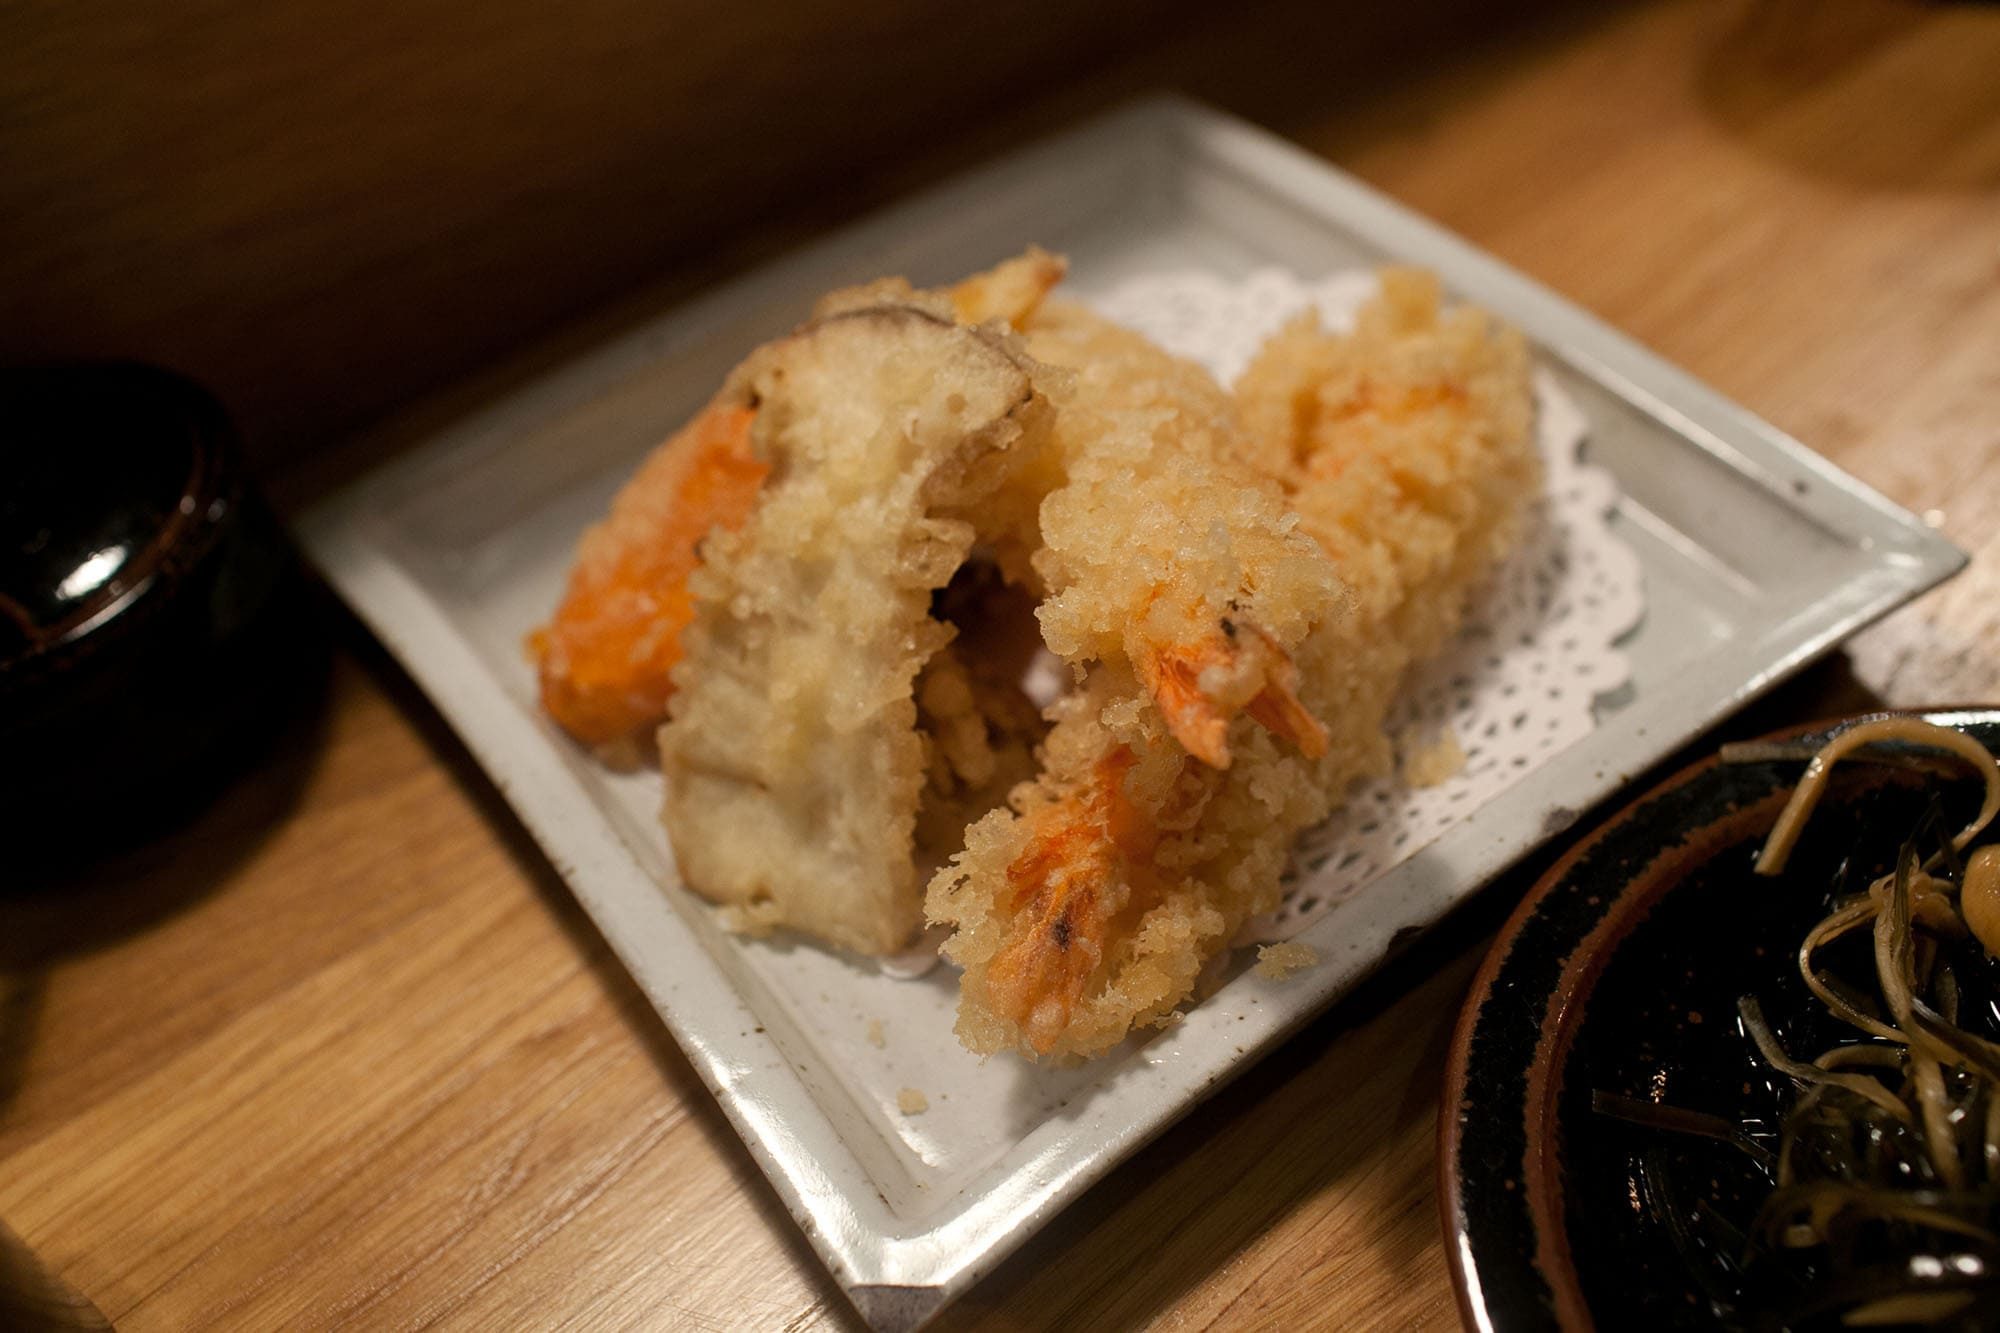 Shrimp and vegetable tempura at Koya Bar in Soho, London, England